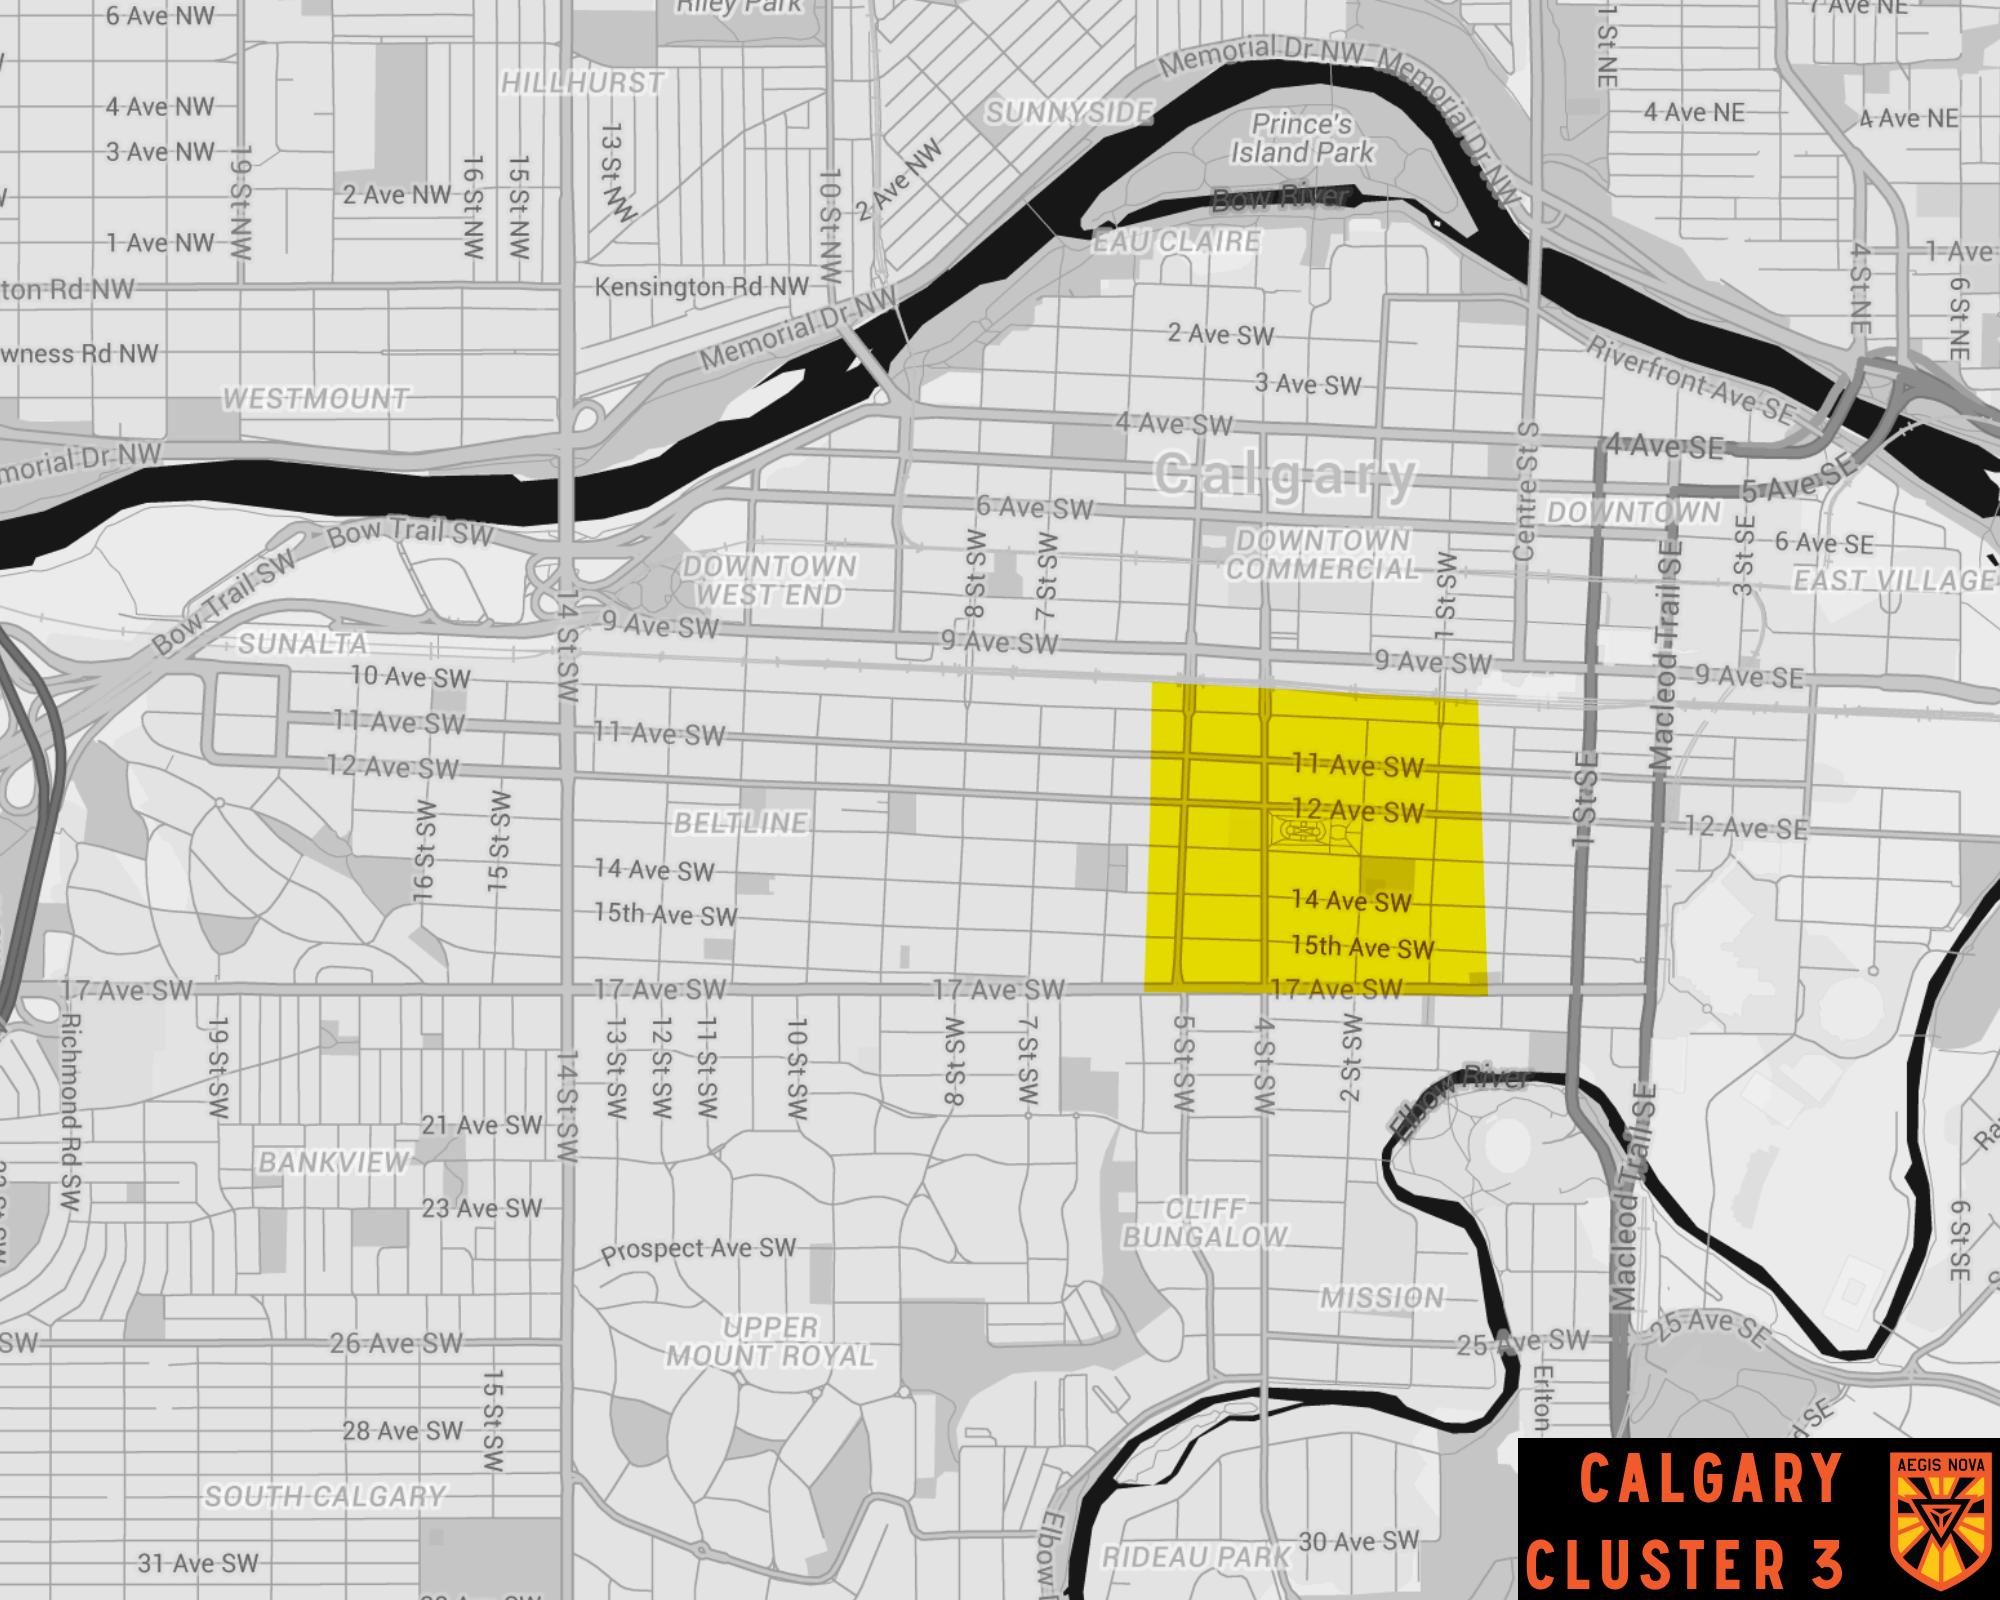 CalgaryCluster3.png